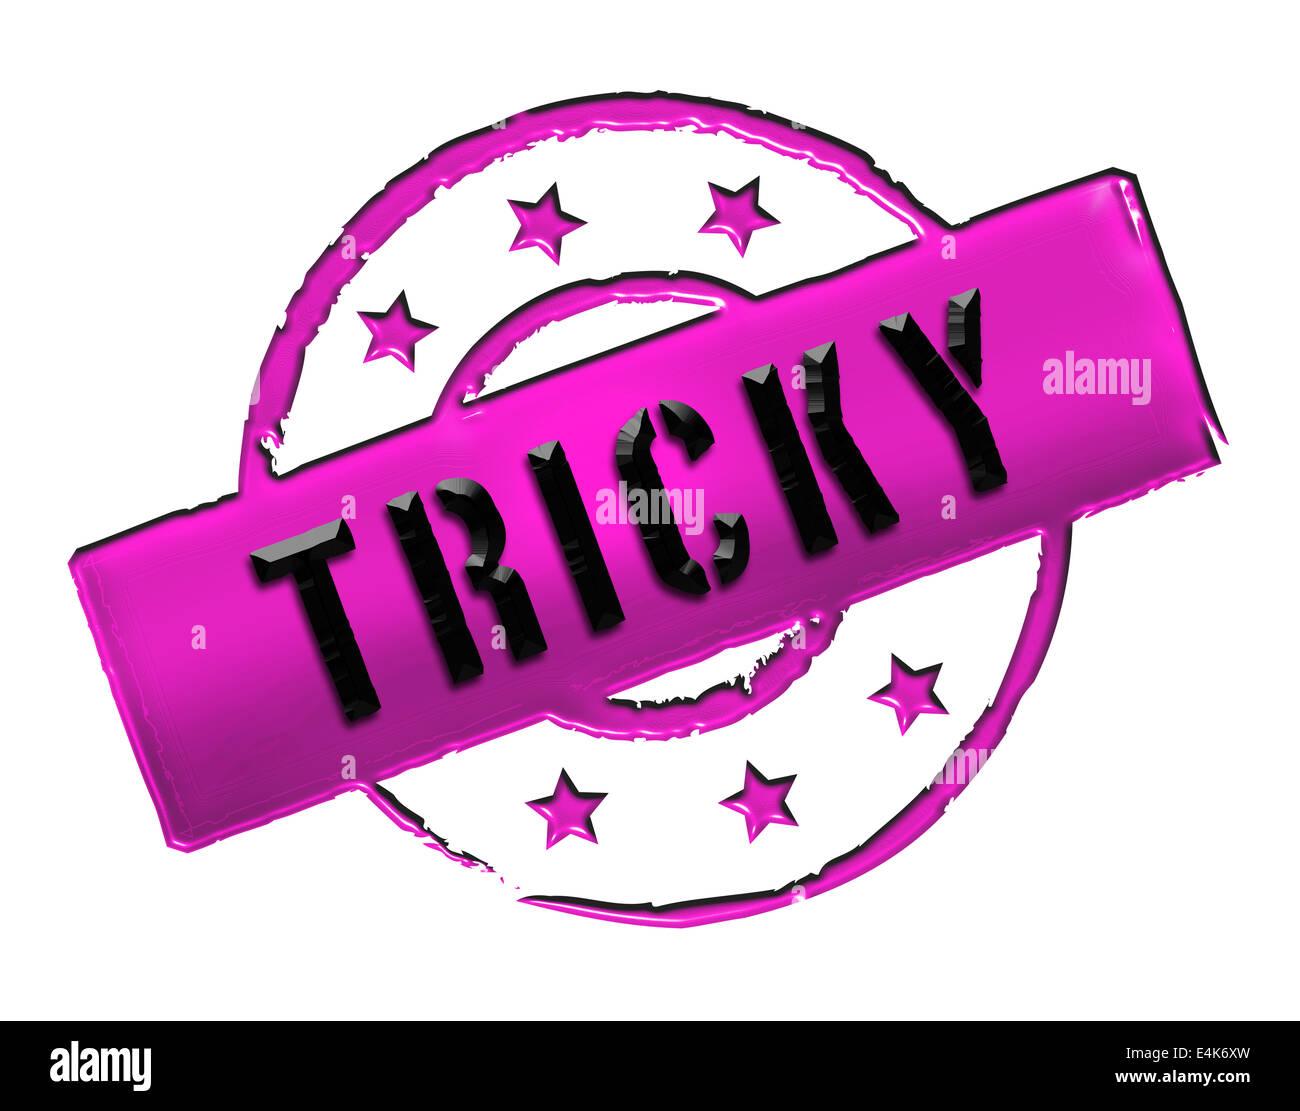 Stamp - TRICKY - Stock Image